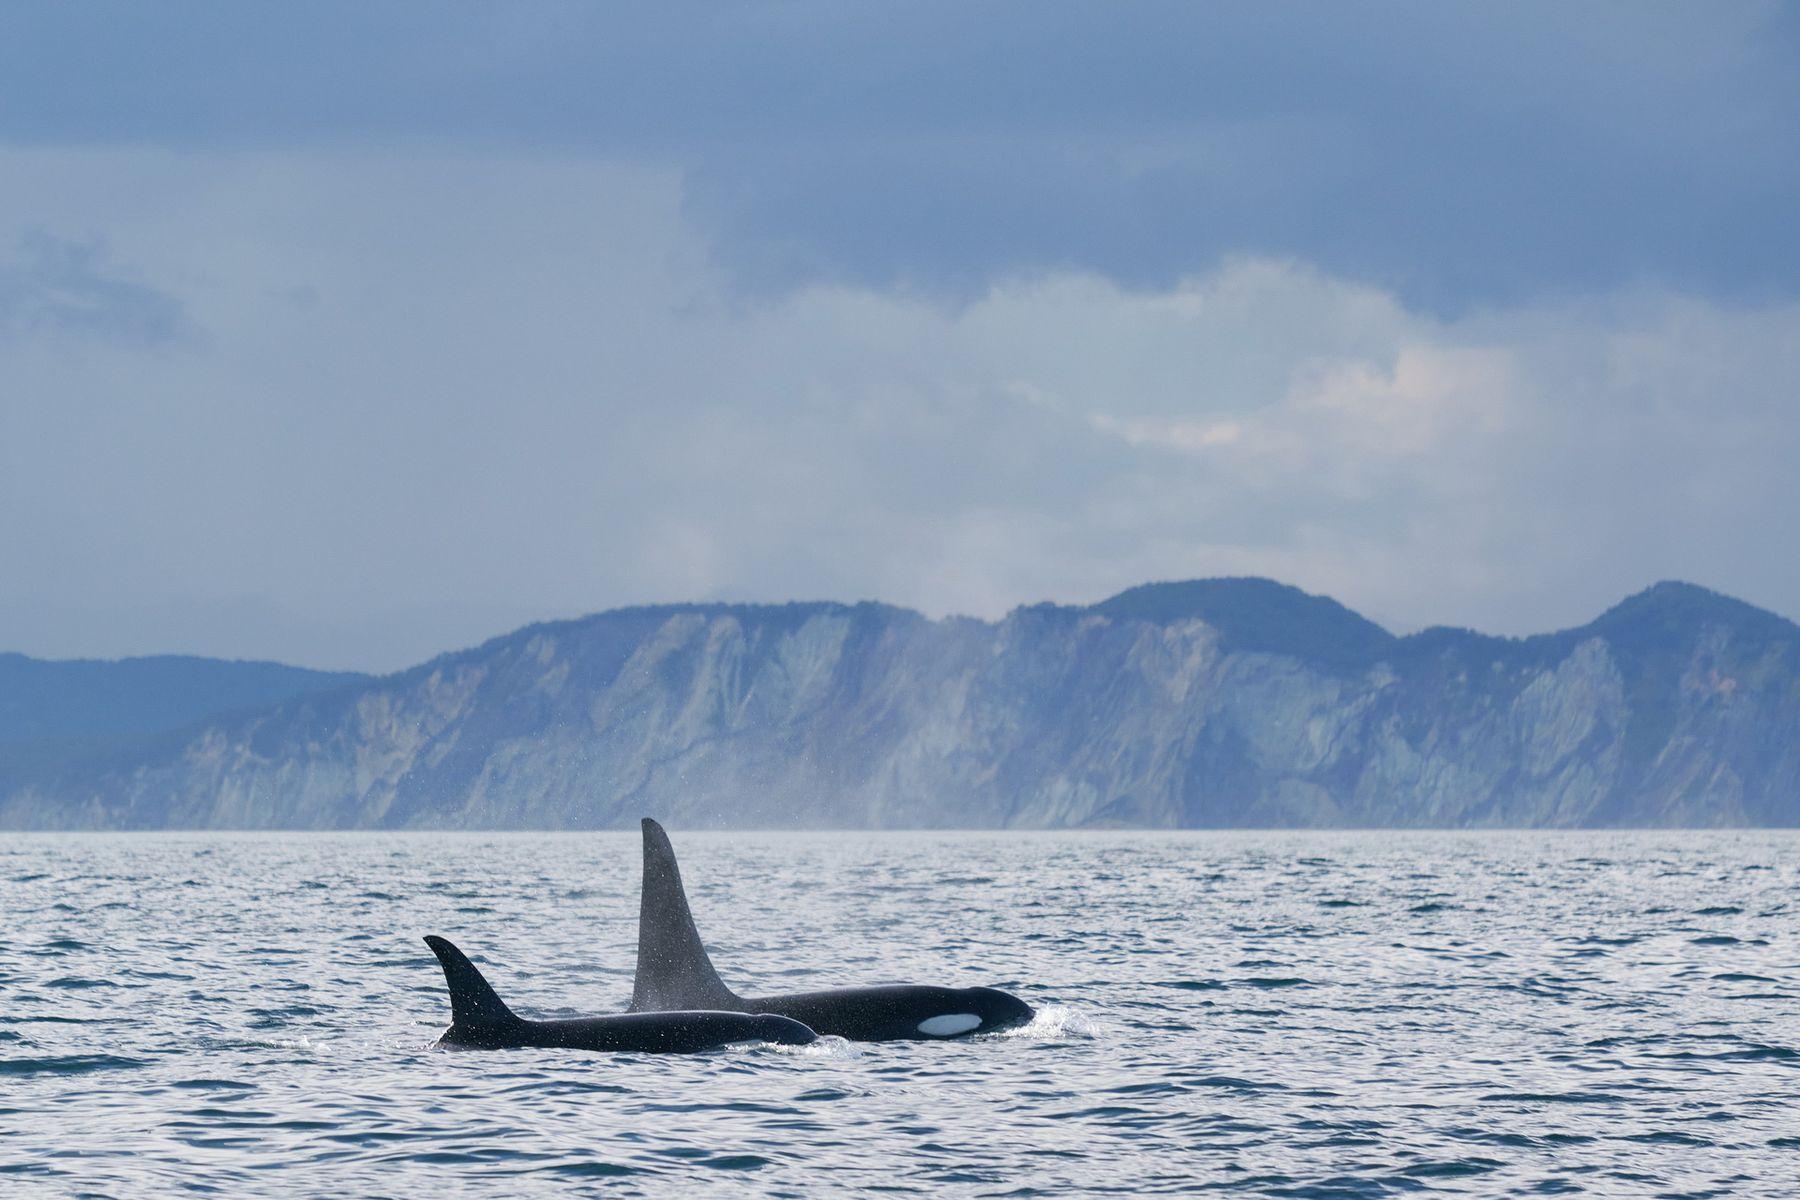 Косатки Косатка Orca killerwhale orcinusorca Камчатка Kamchatka океан Тихийокеан ocean Pacificocean SAL-70200G2